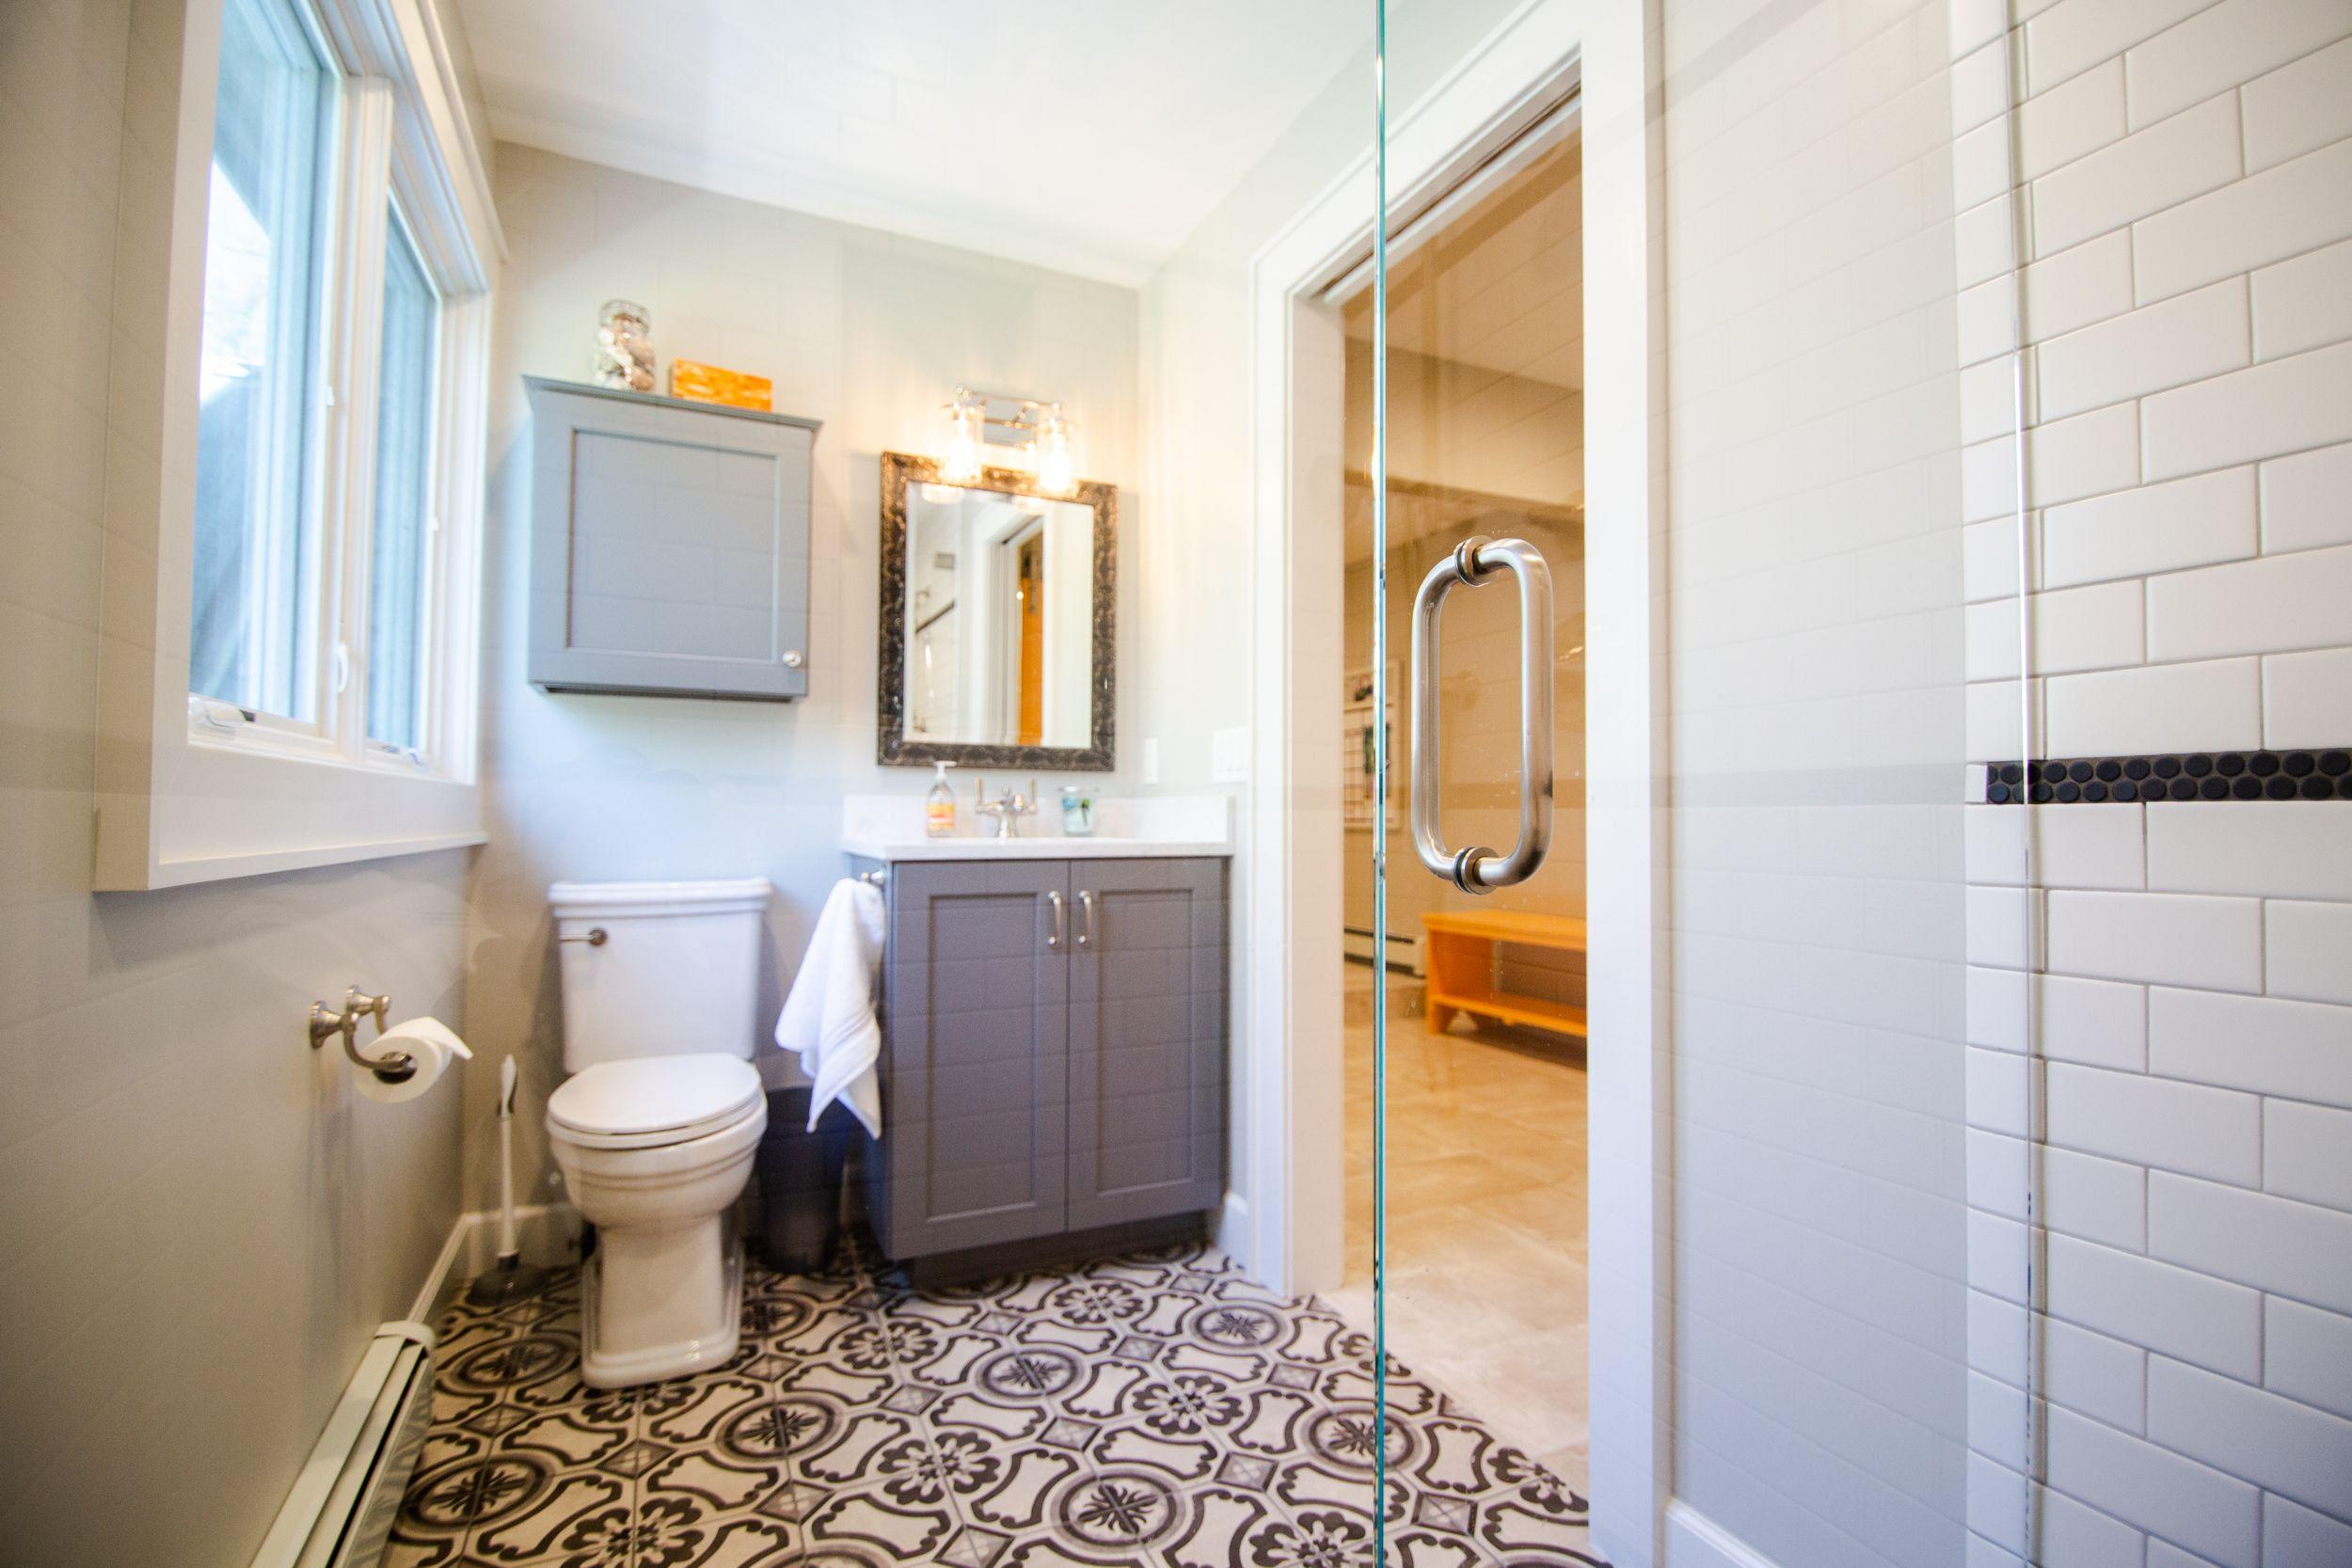 Small Bathroom Patterned Floor Tile Custom Mirror Vanity Mouser Cabinetry